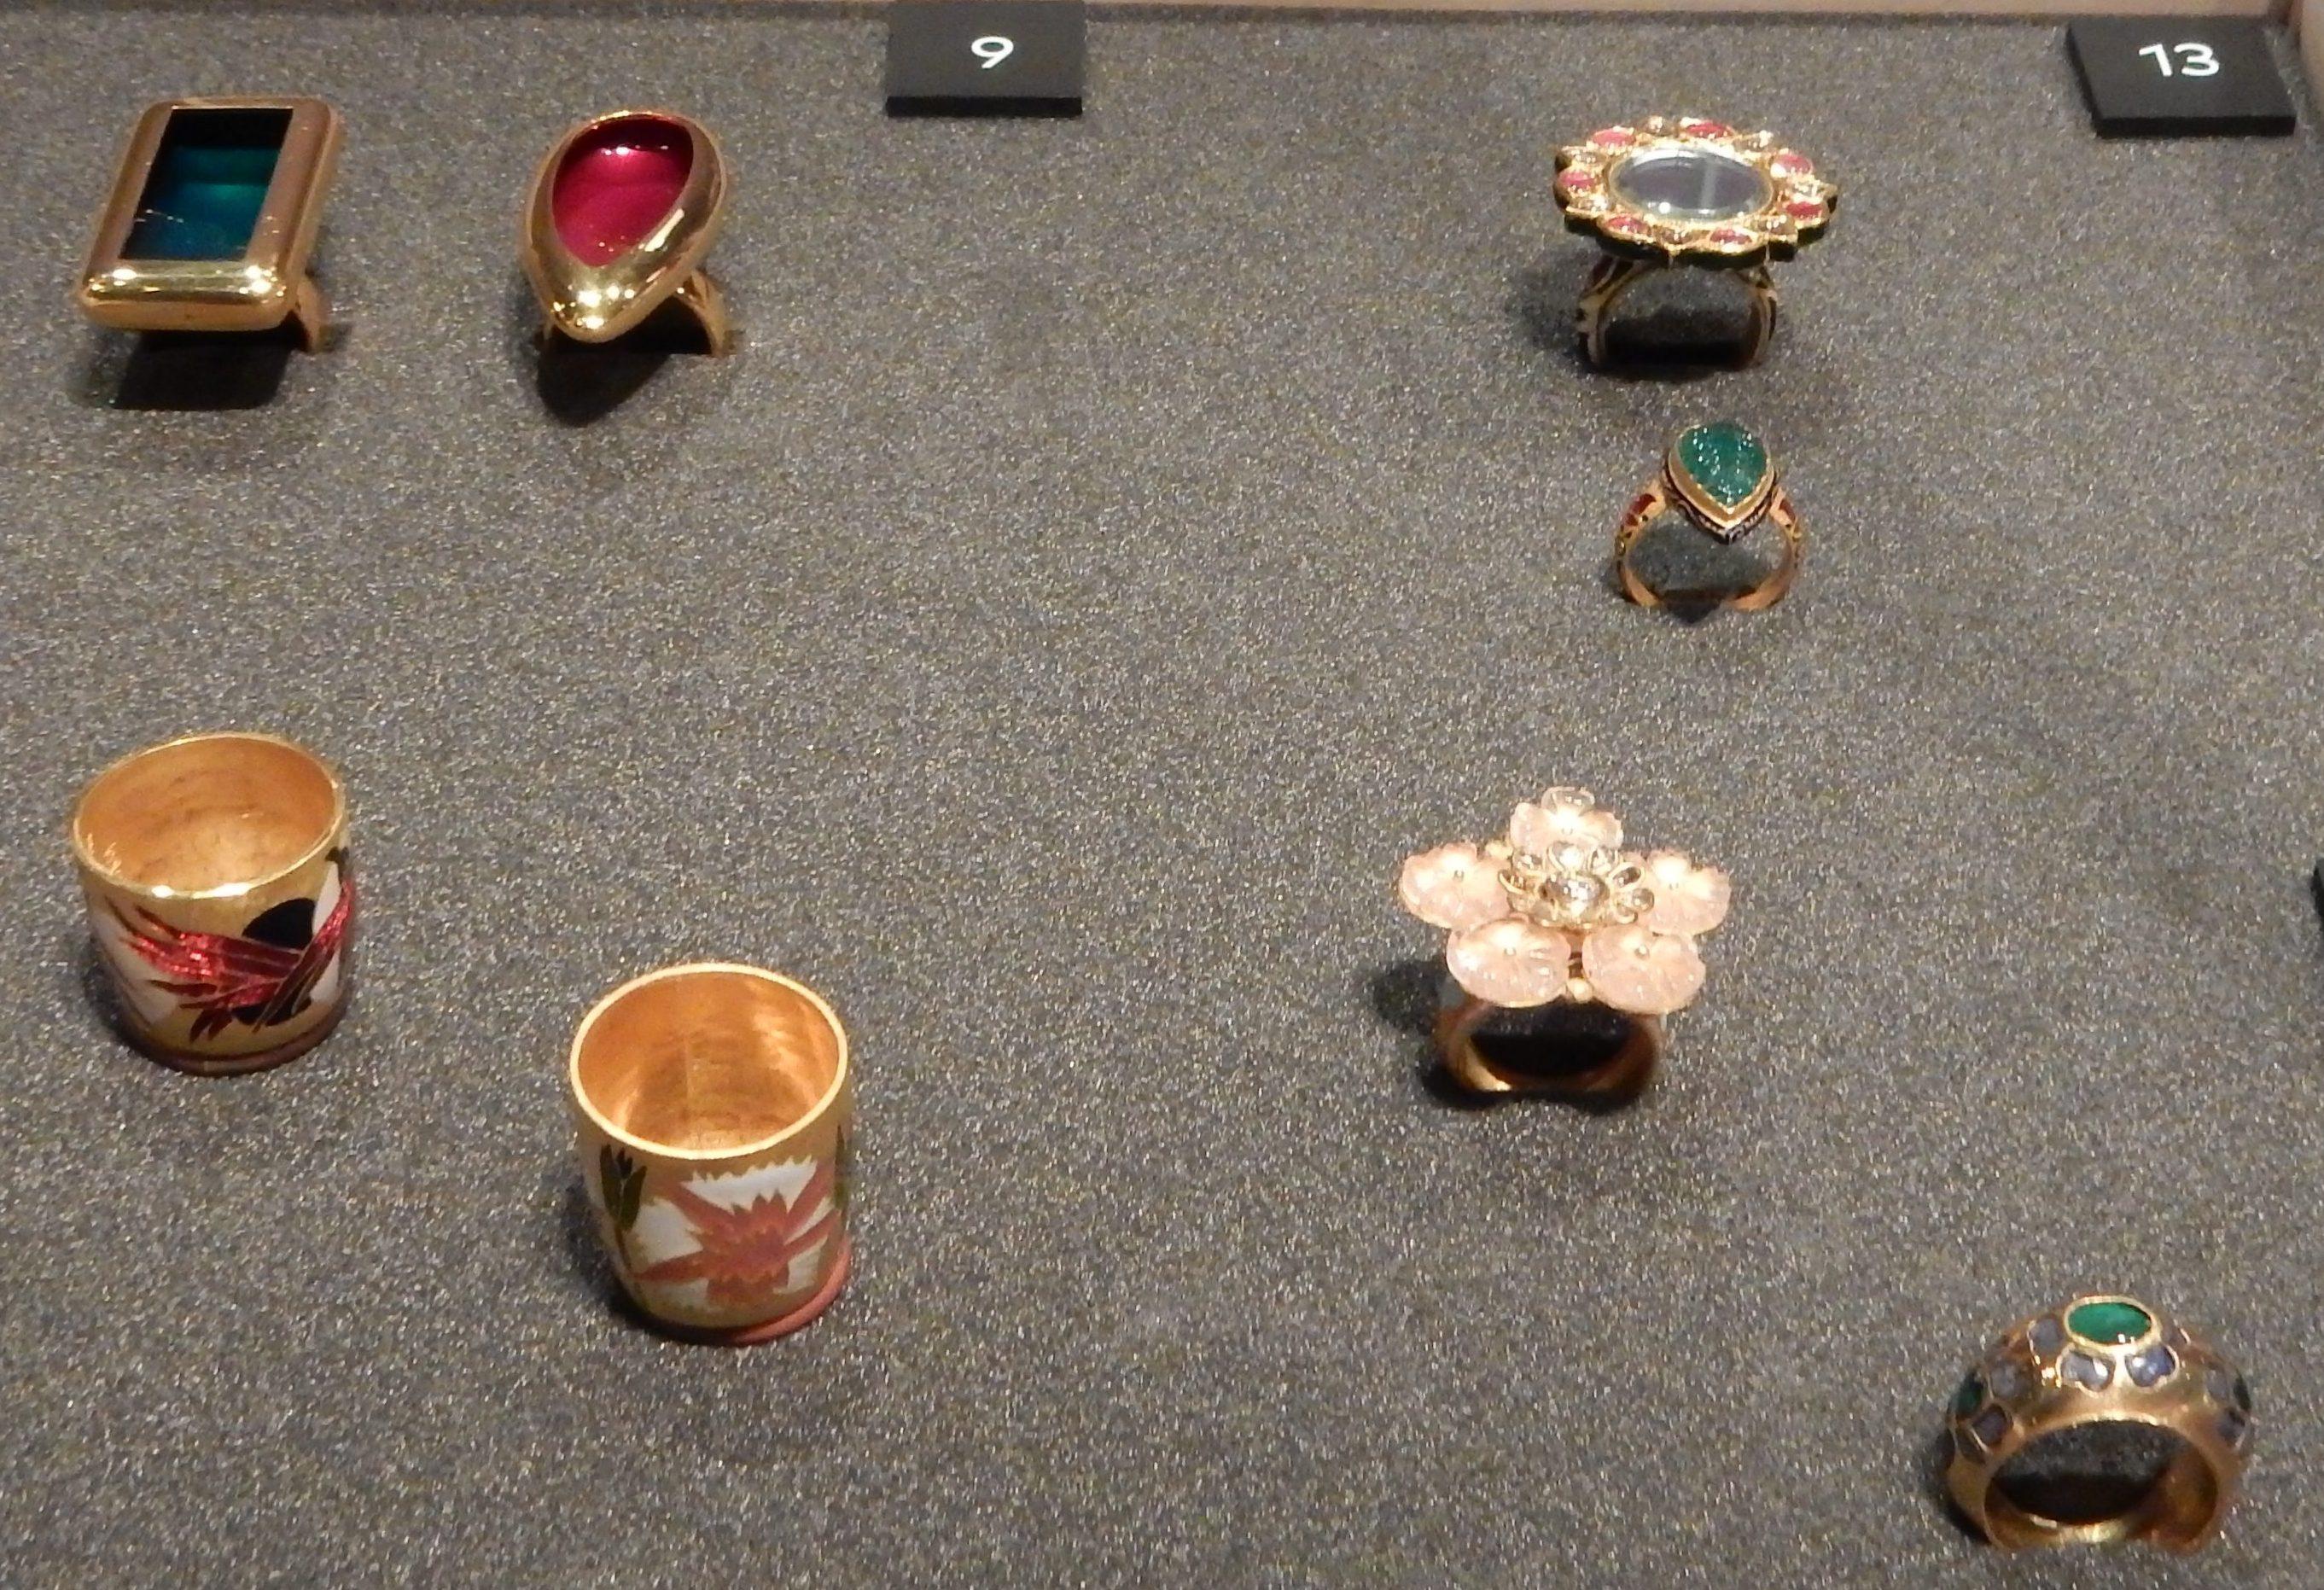 Sieraden, makers en dragers, Goud, ringen. Afrika Museum, Berg en Dal. Foto met dank aan Coert Peter Krabbe, 2018, CC BY 4.0